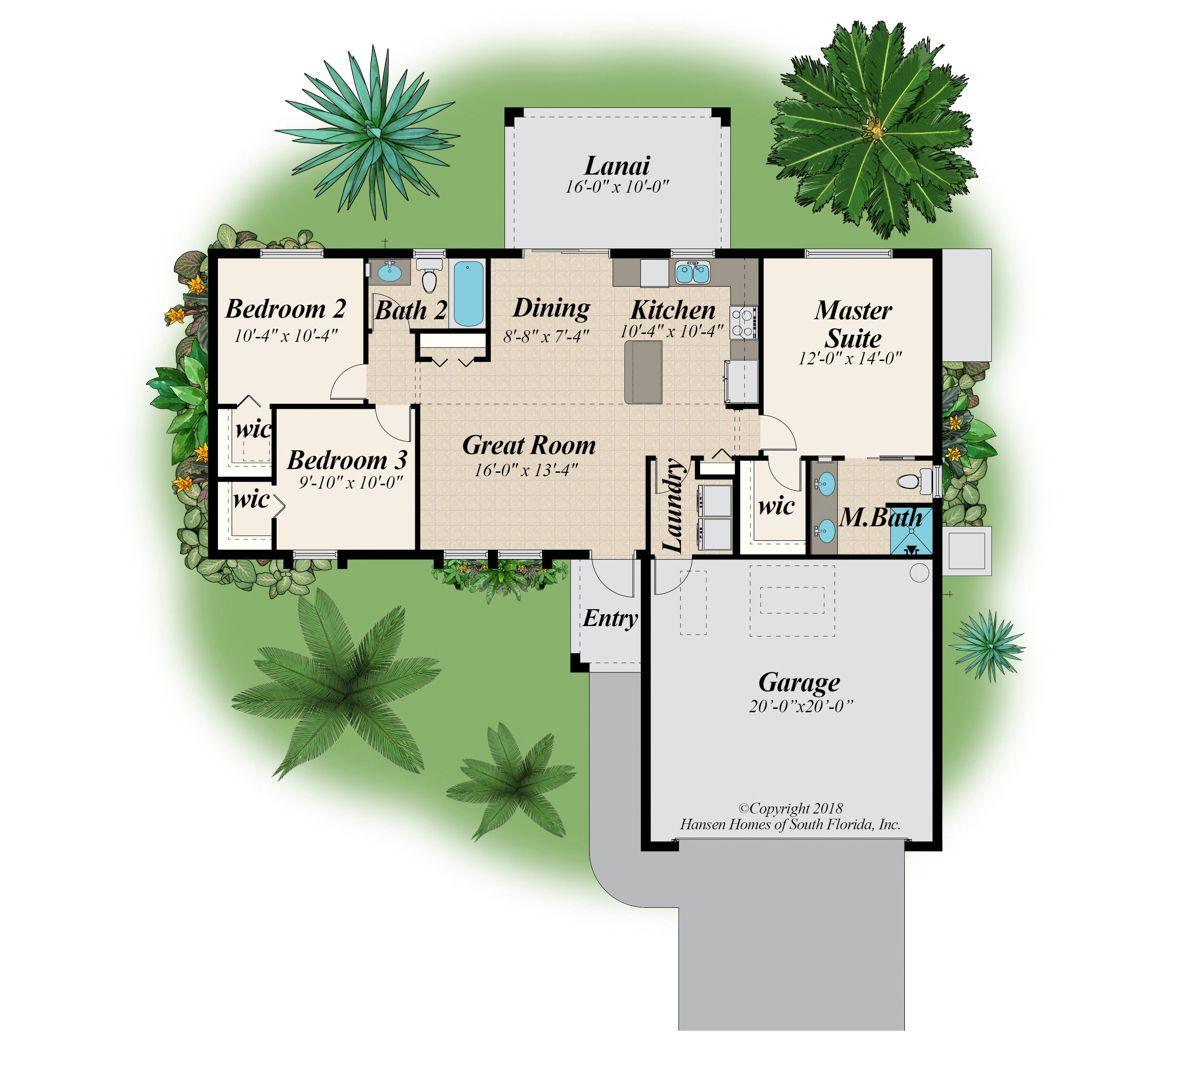 The Bayshore Home Plan 4 Bedroom 2 Bath 2 Car Garage 1 144 Sq Ft Living Space House Plans Living Spaces Car Garage